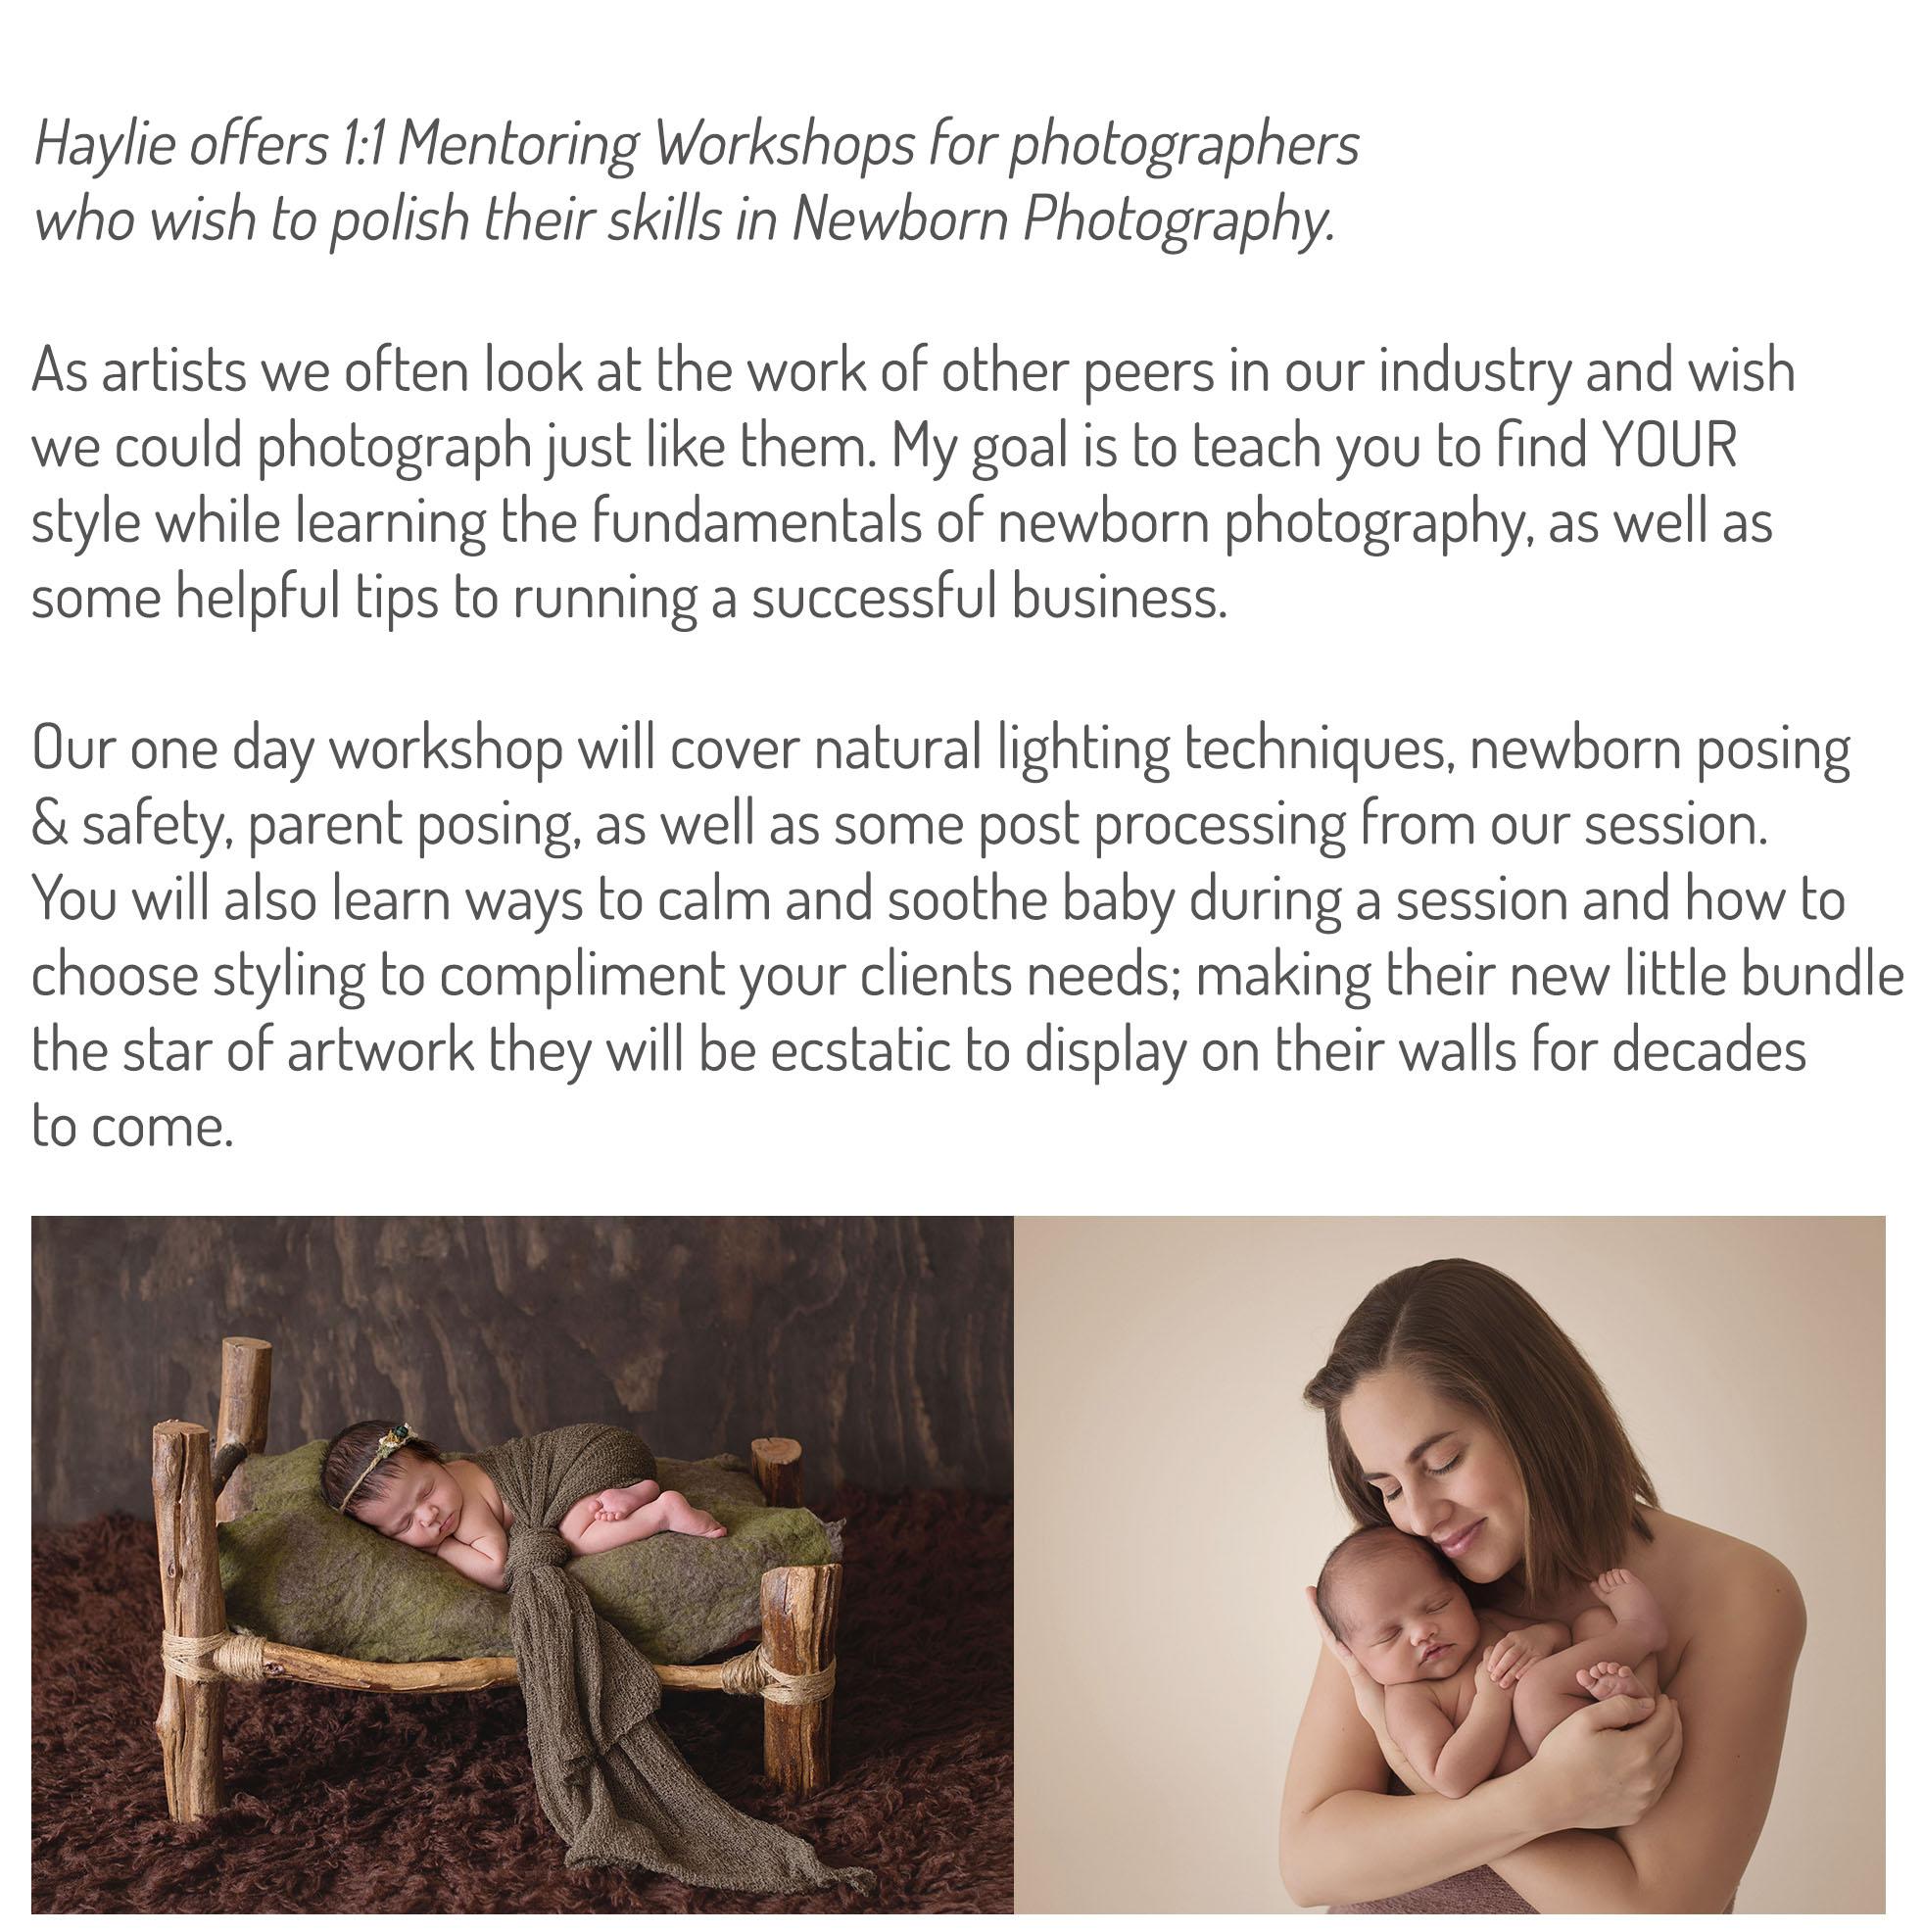 Gold Coast Newborn Workshops mentoring haylie D photography